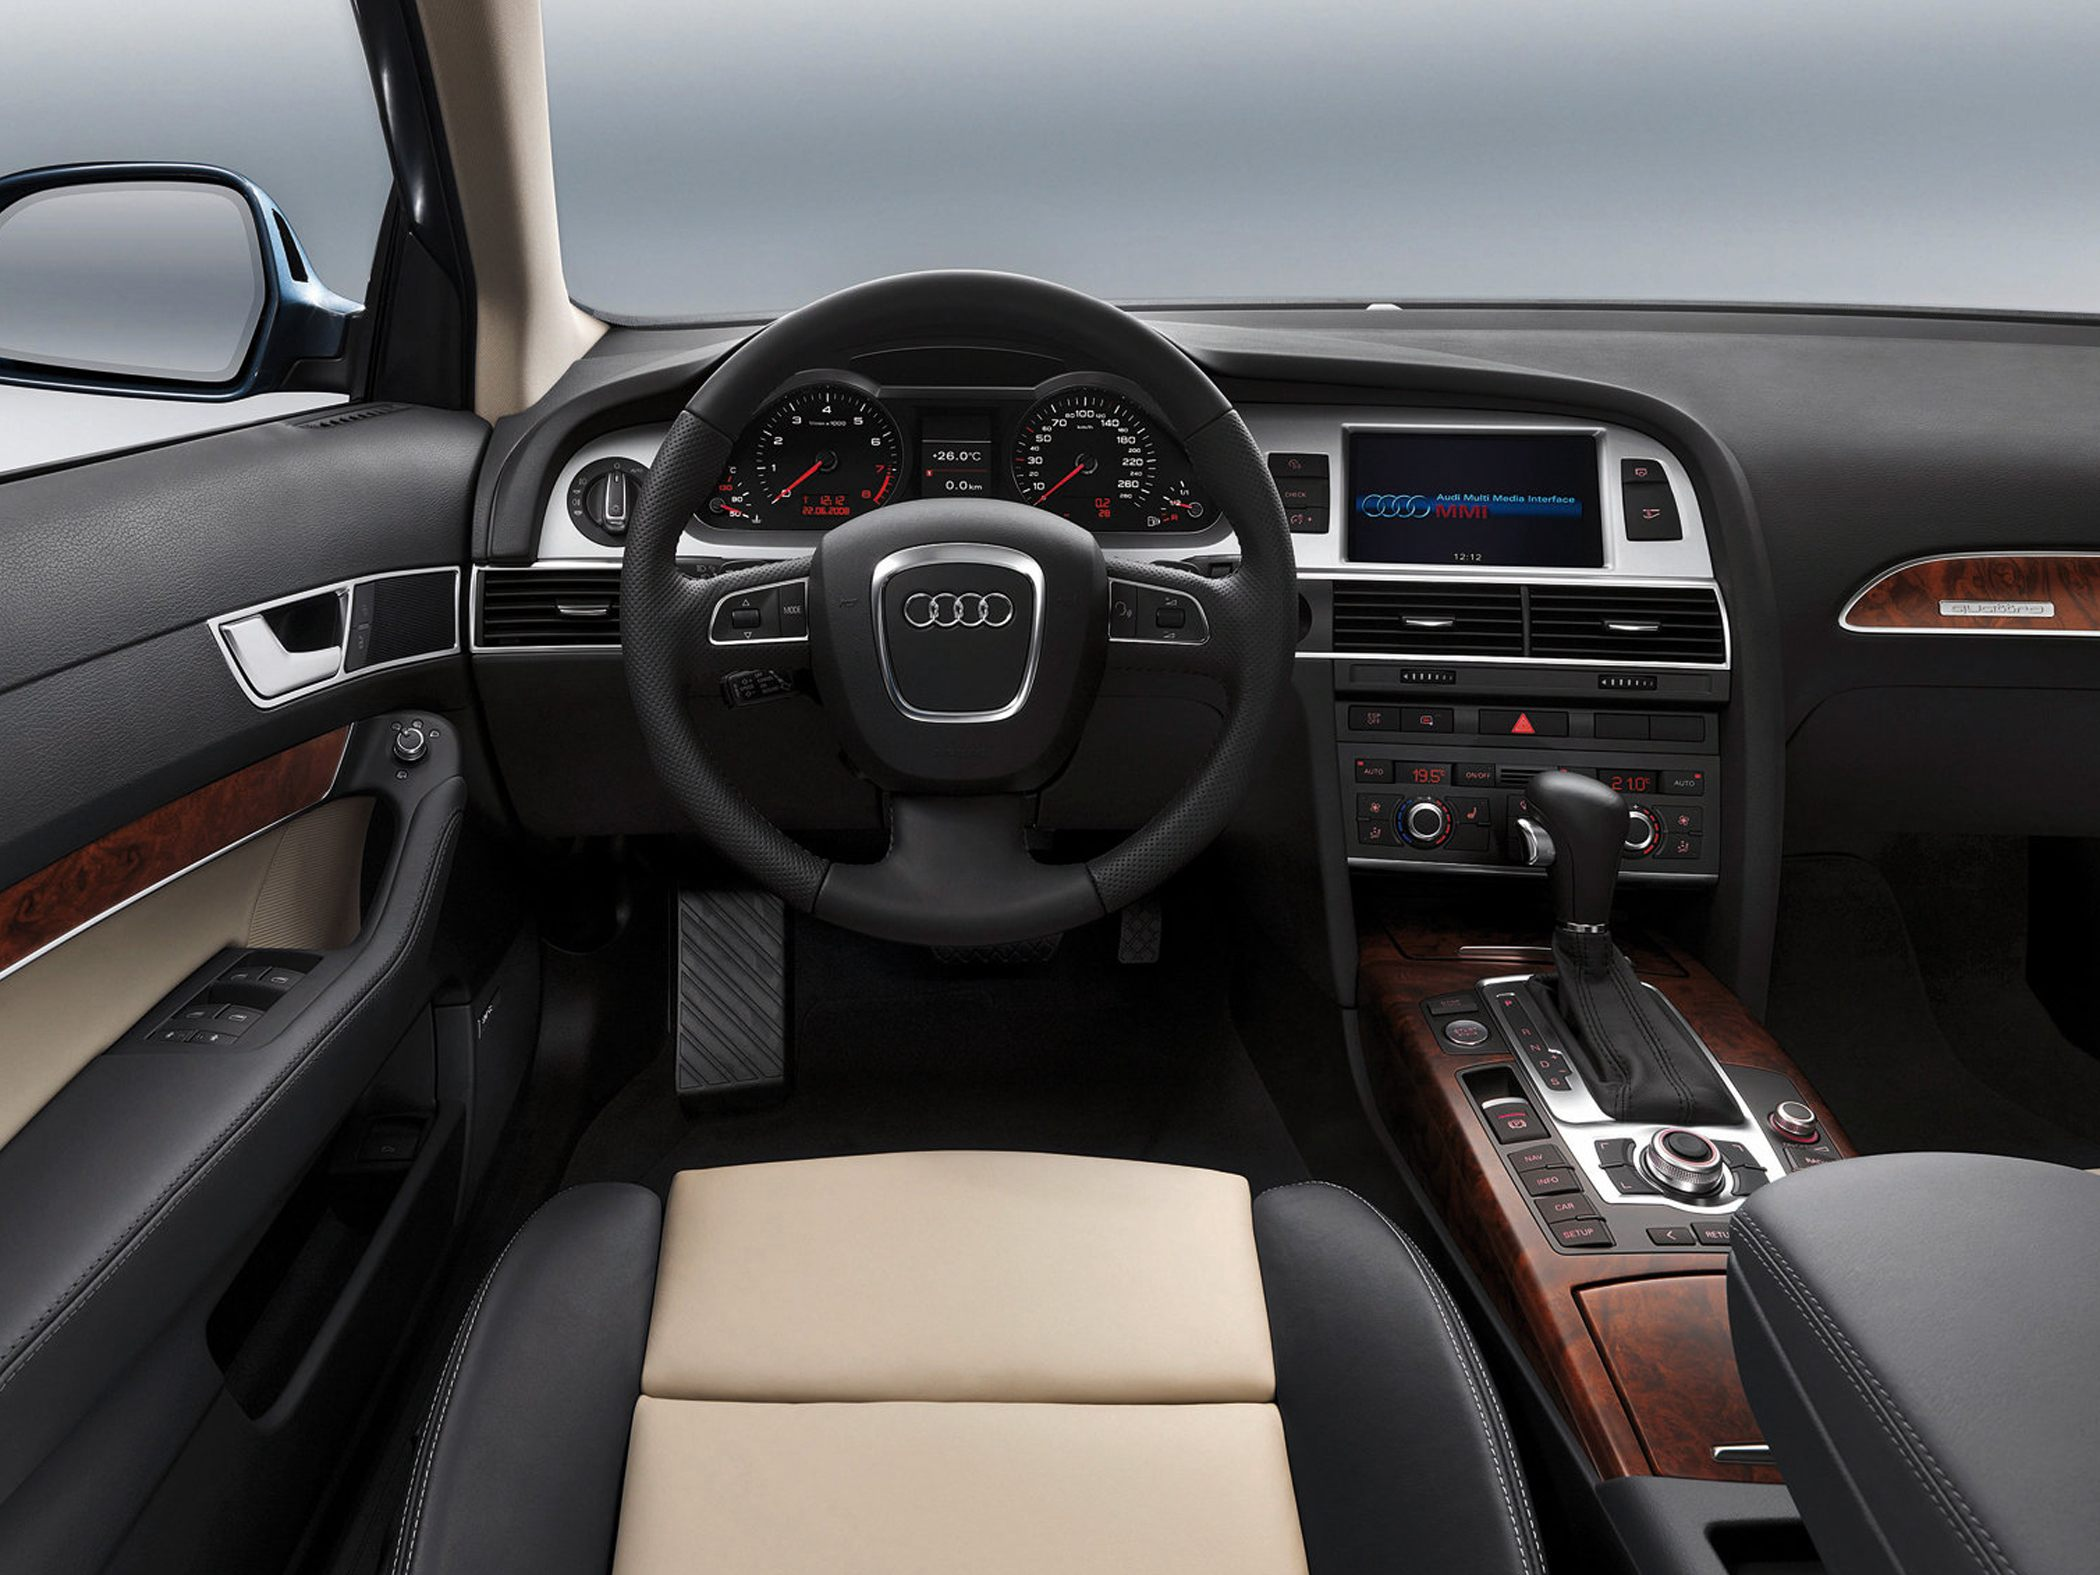 2010 Audi A6 Image 15